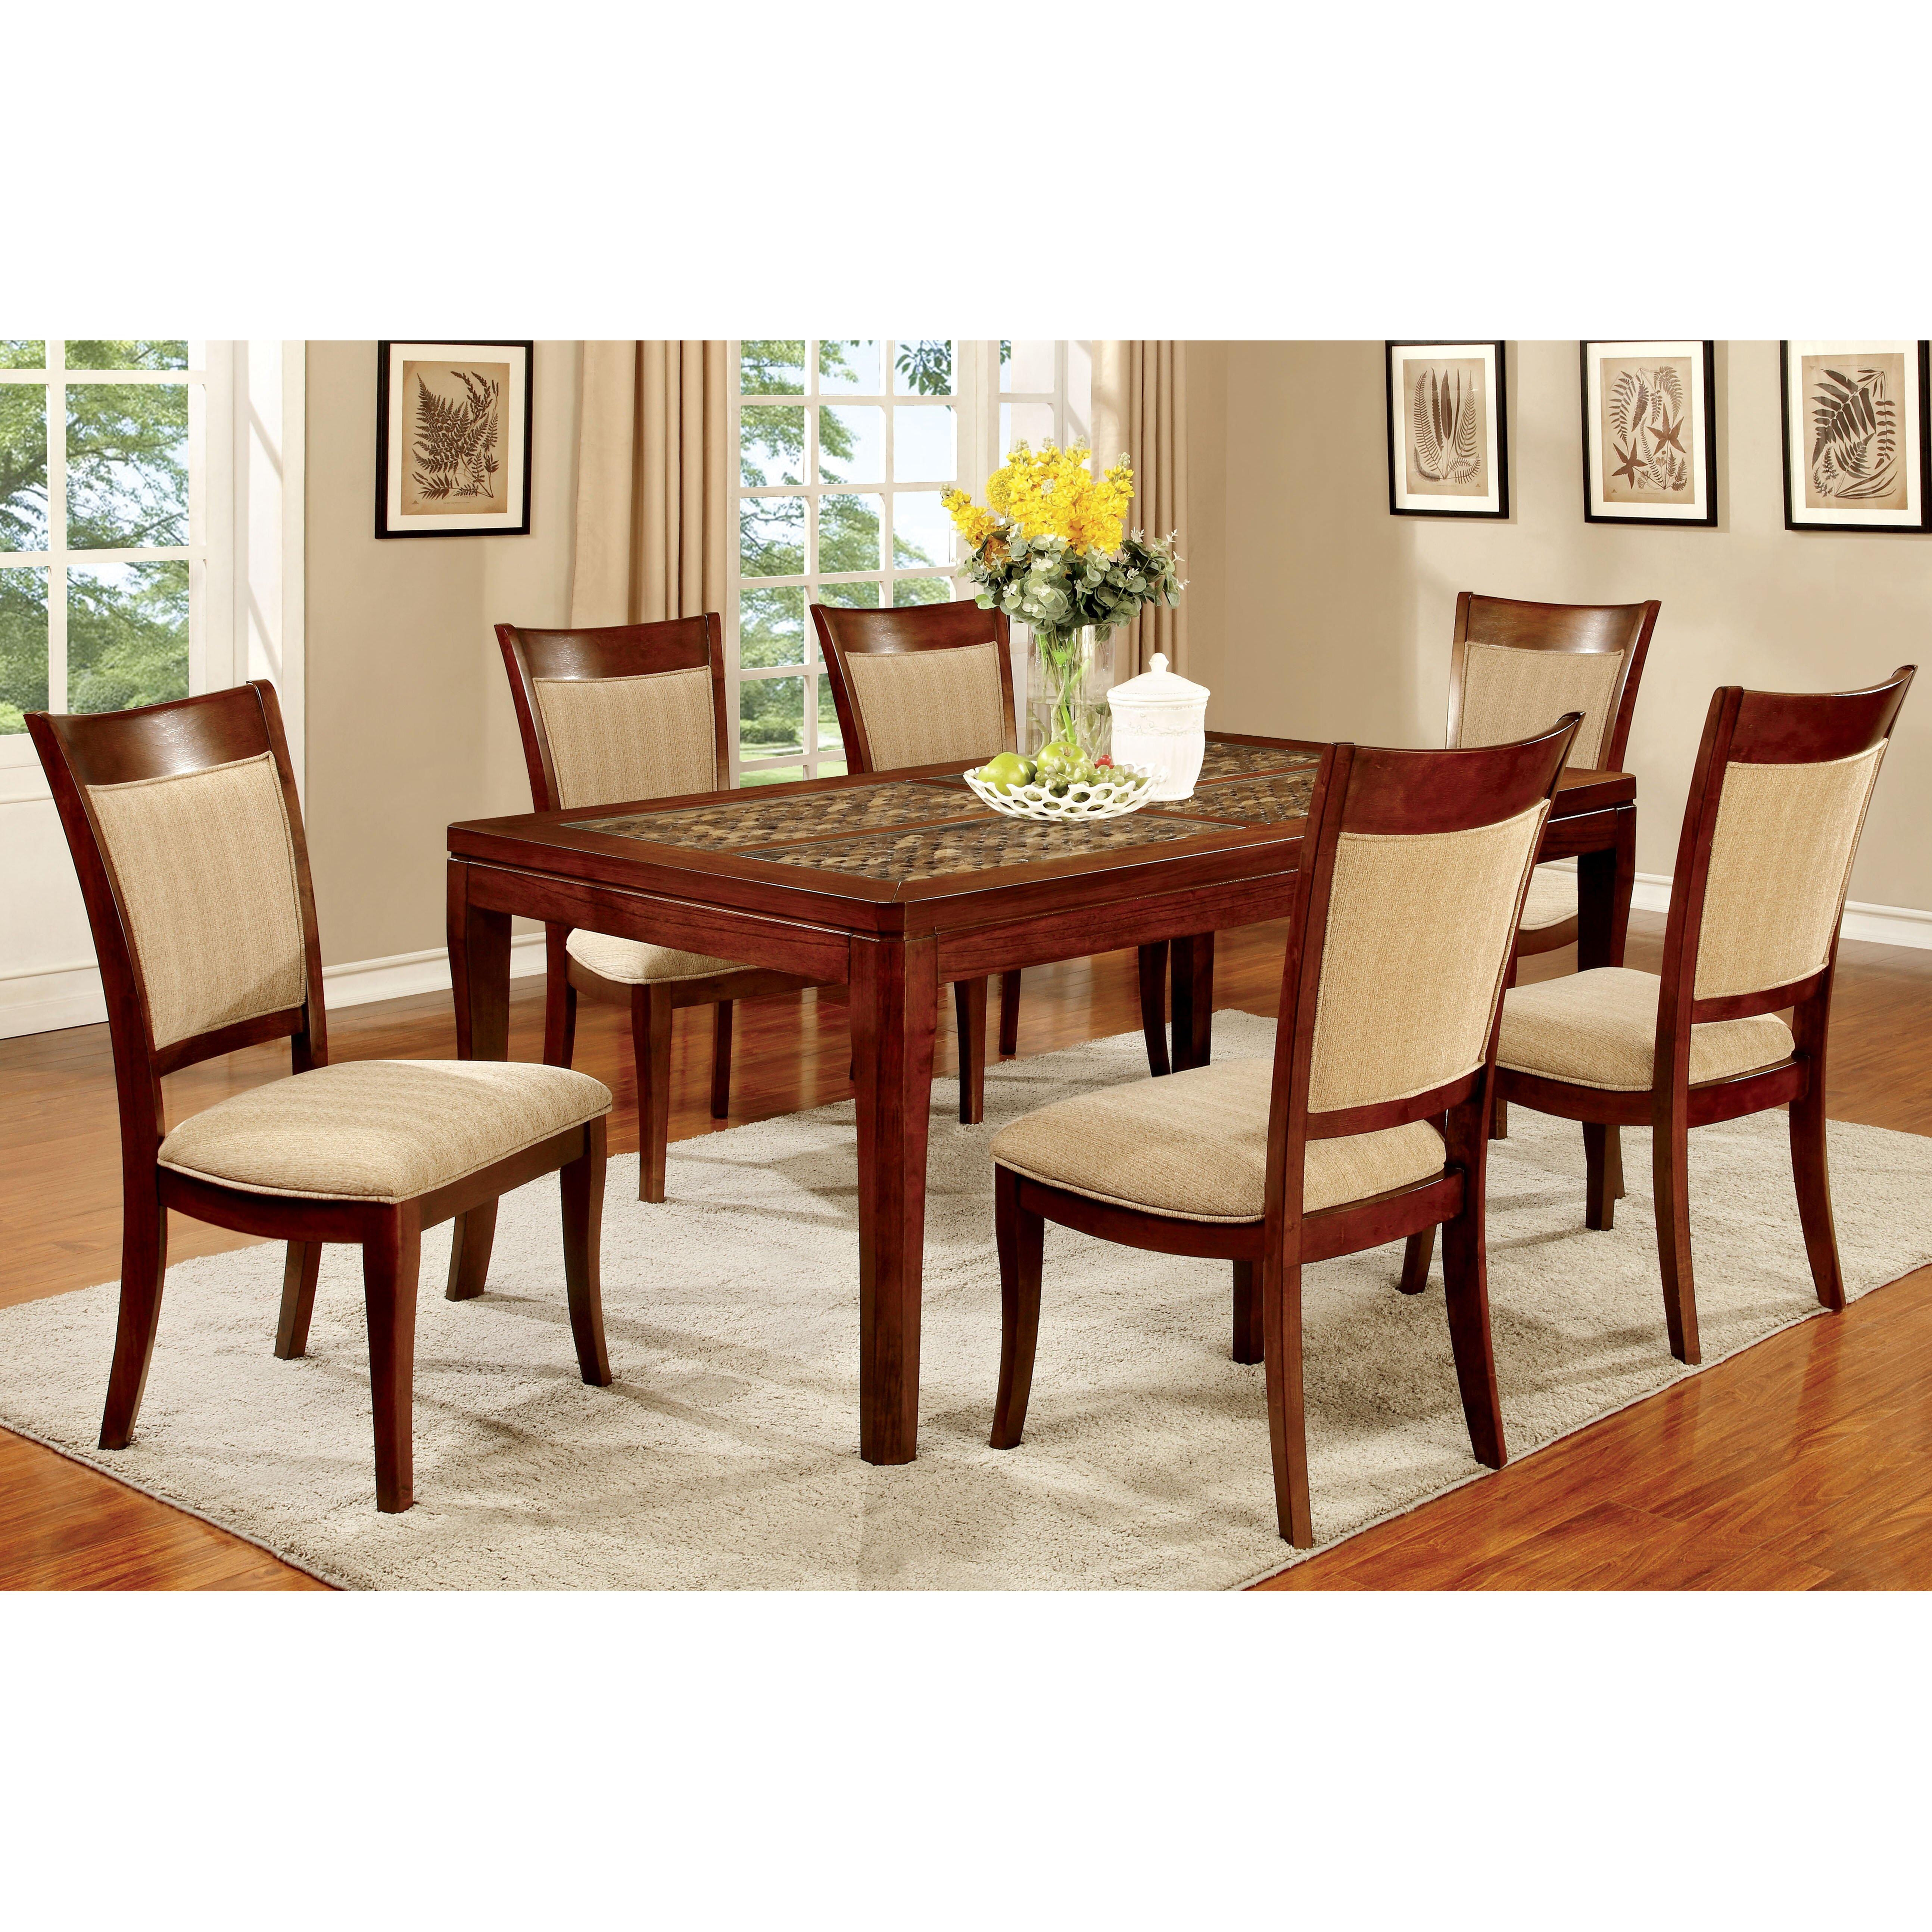 Hokku designs leto 7 piece dining set reviews wayfair for Hokku designs dining room furniture